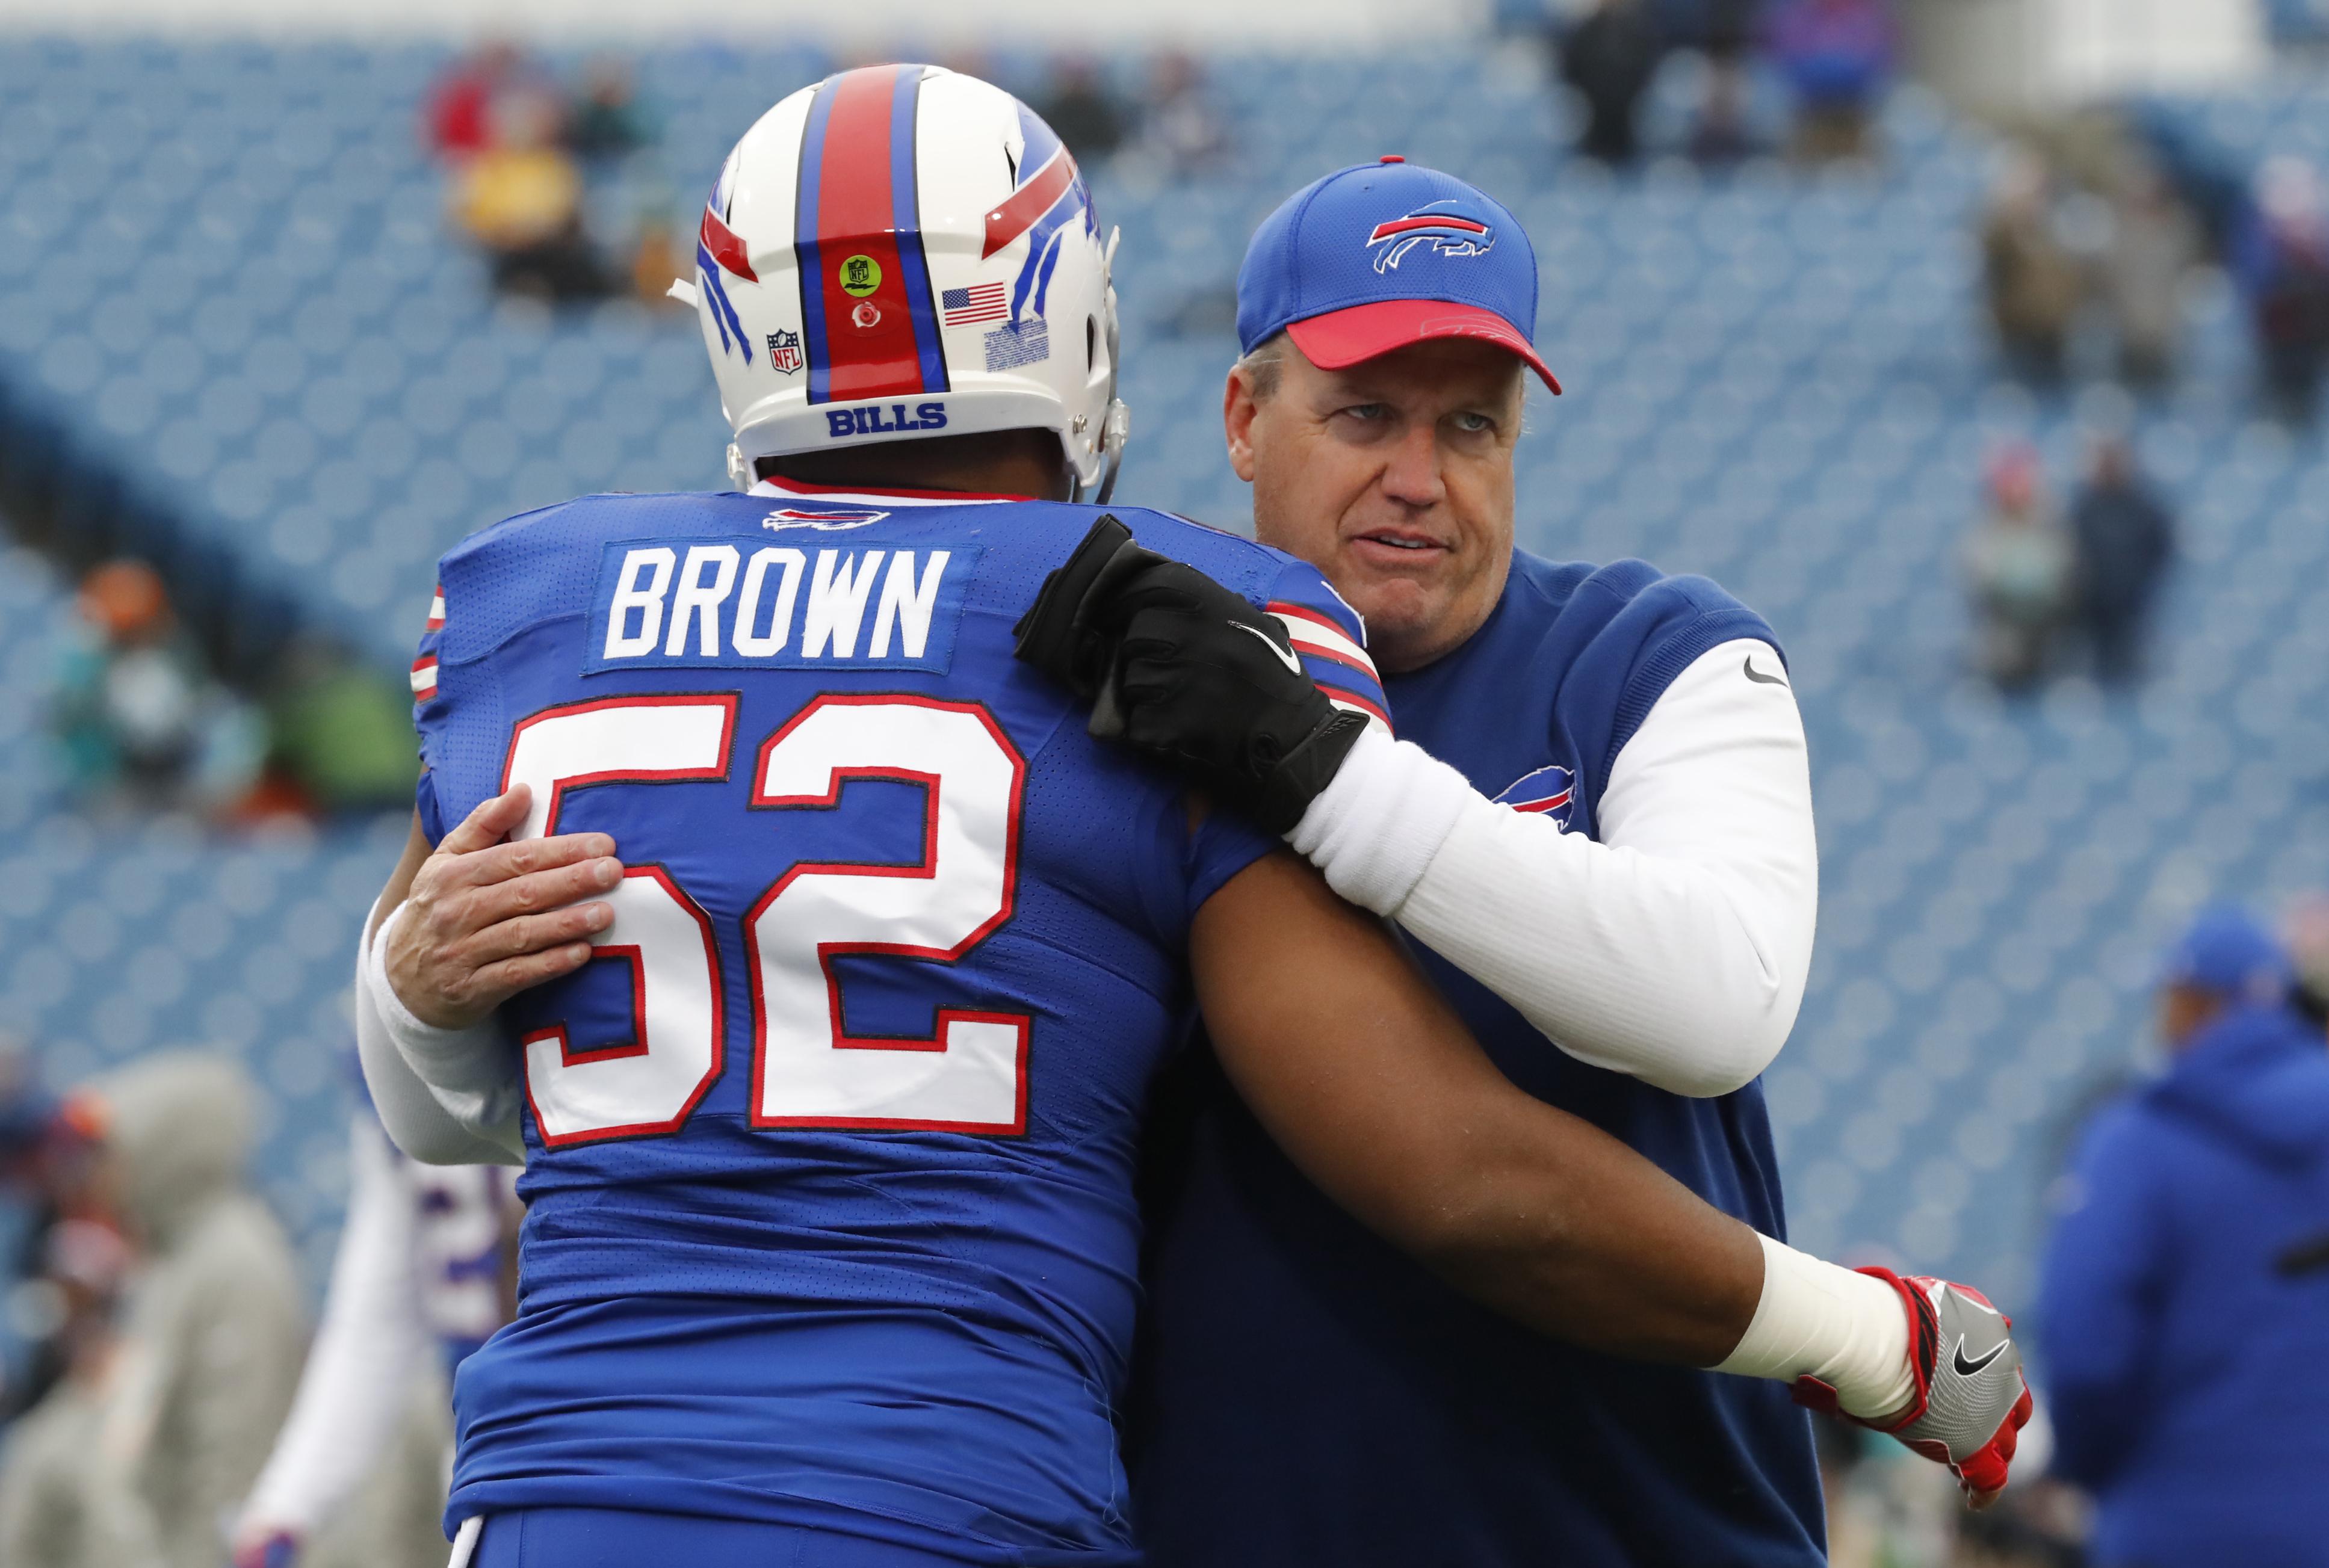 Buffalo Bills coach Rex Ryan hugs Preston Brown prior to Saturday's game. (Harry Scull Jr./Buffalo News)